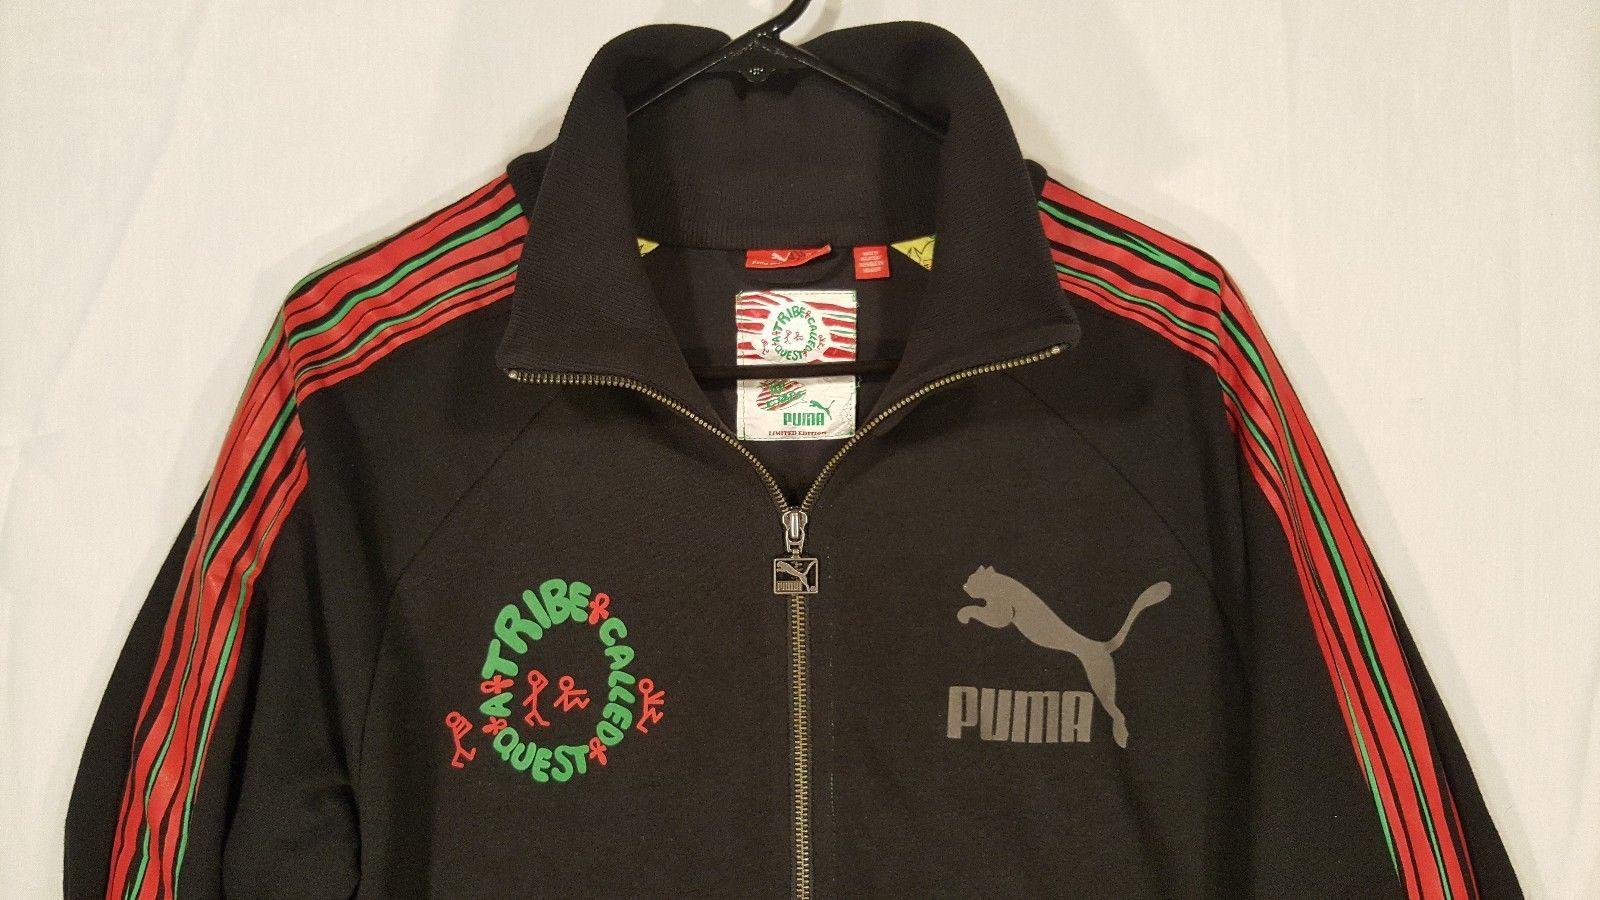 Pinchazo sociedad Bóveda  YO! MTV A Tribe Called Quest X Puma Limited Edition Track Jacket Mens  Medium M | eBay | Mens jackets, Jackets, Track jackets